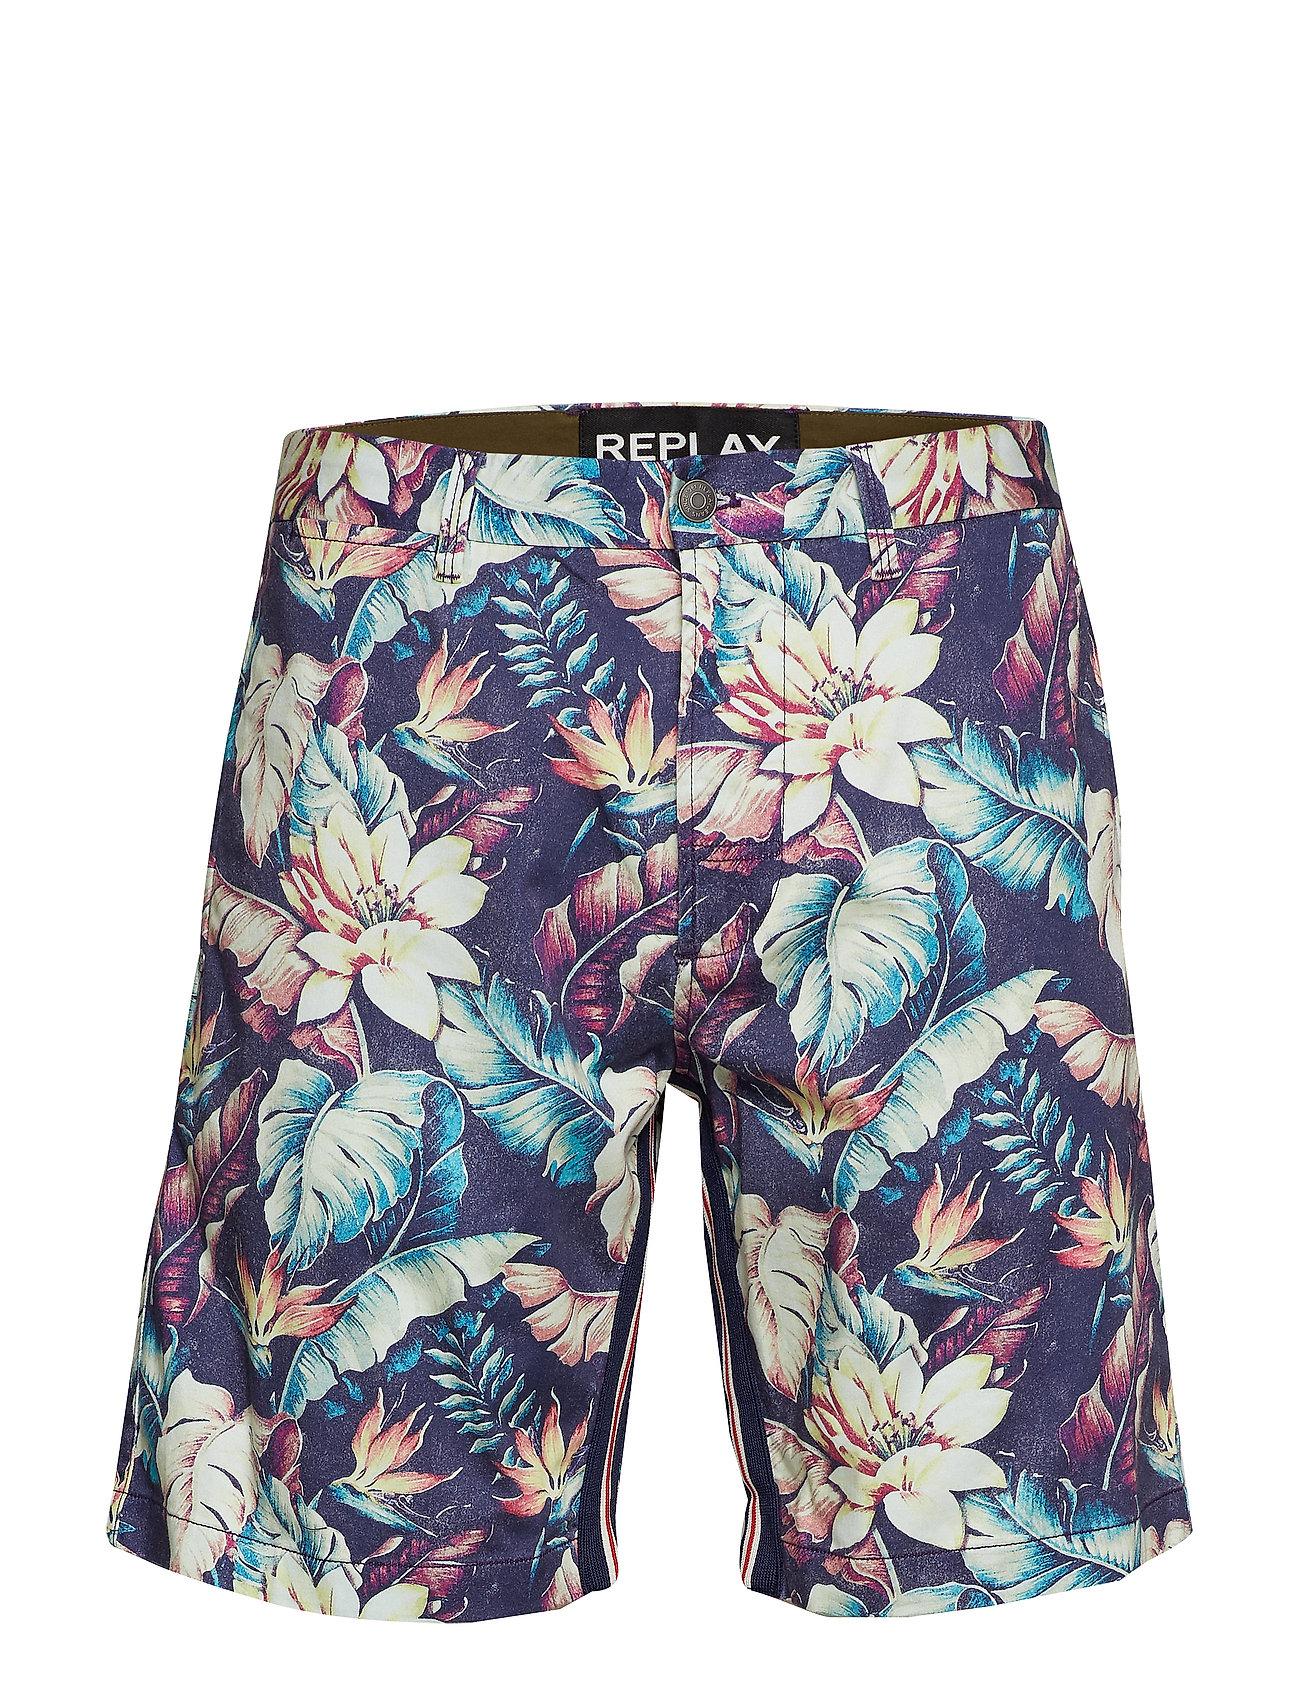 Replay Shorts - HIBISCUS PRINT